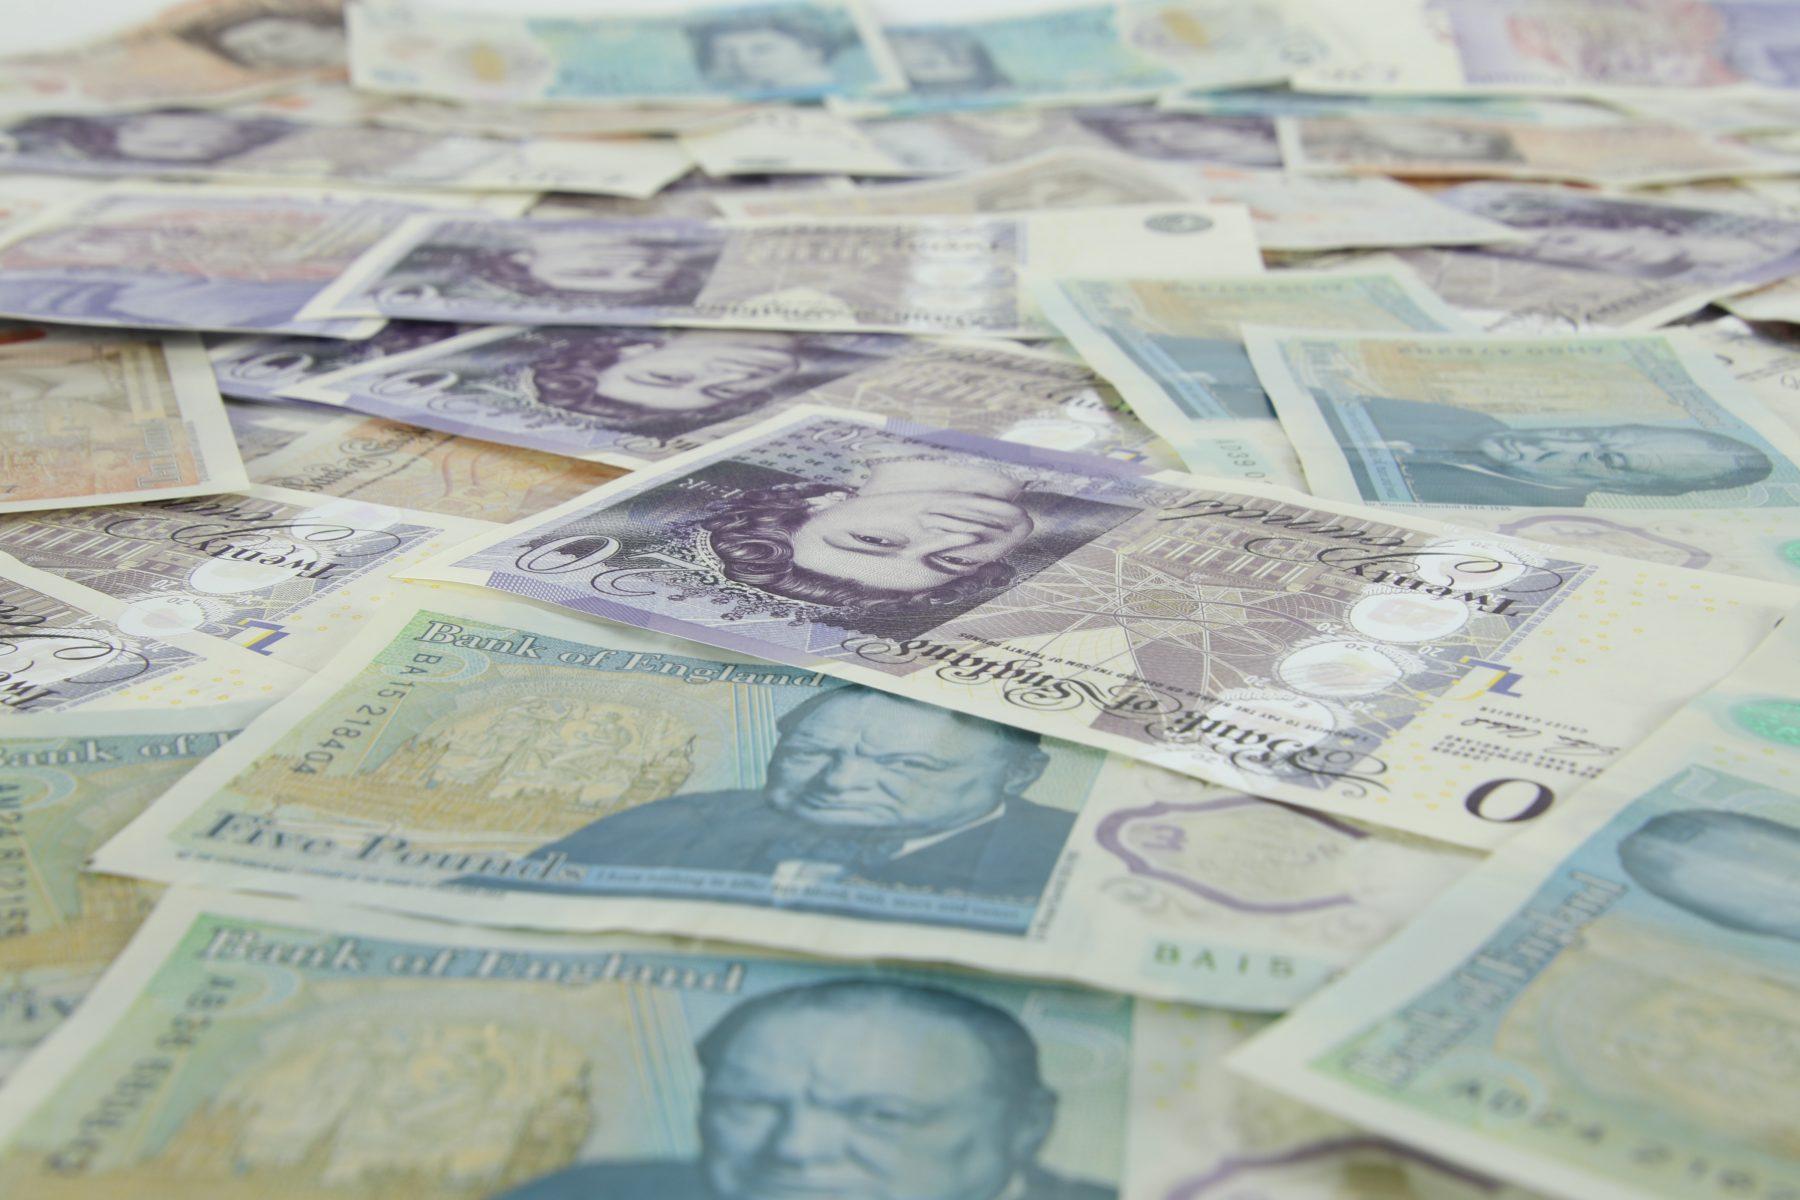 image of UK banknotes